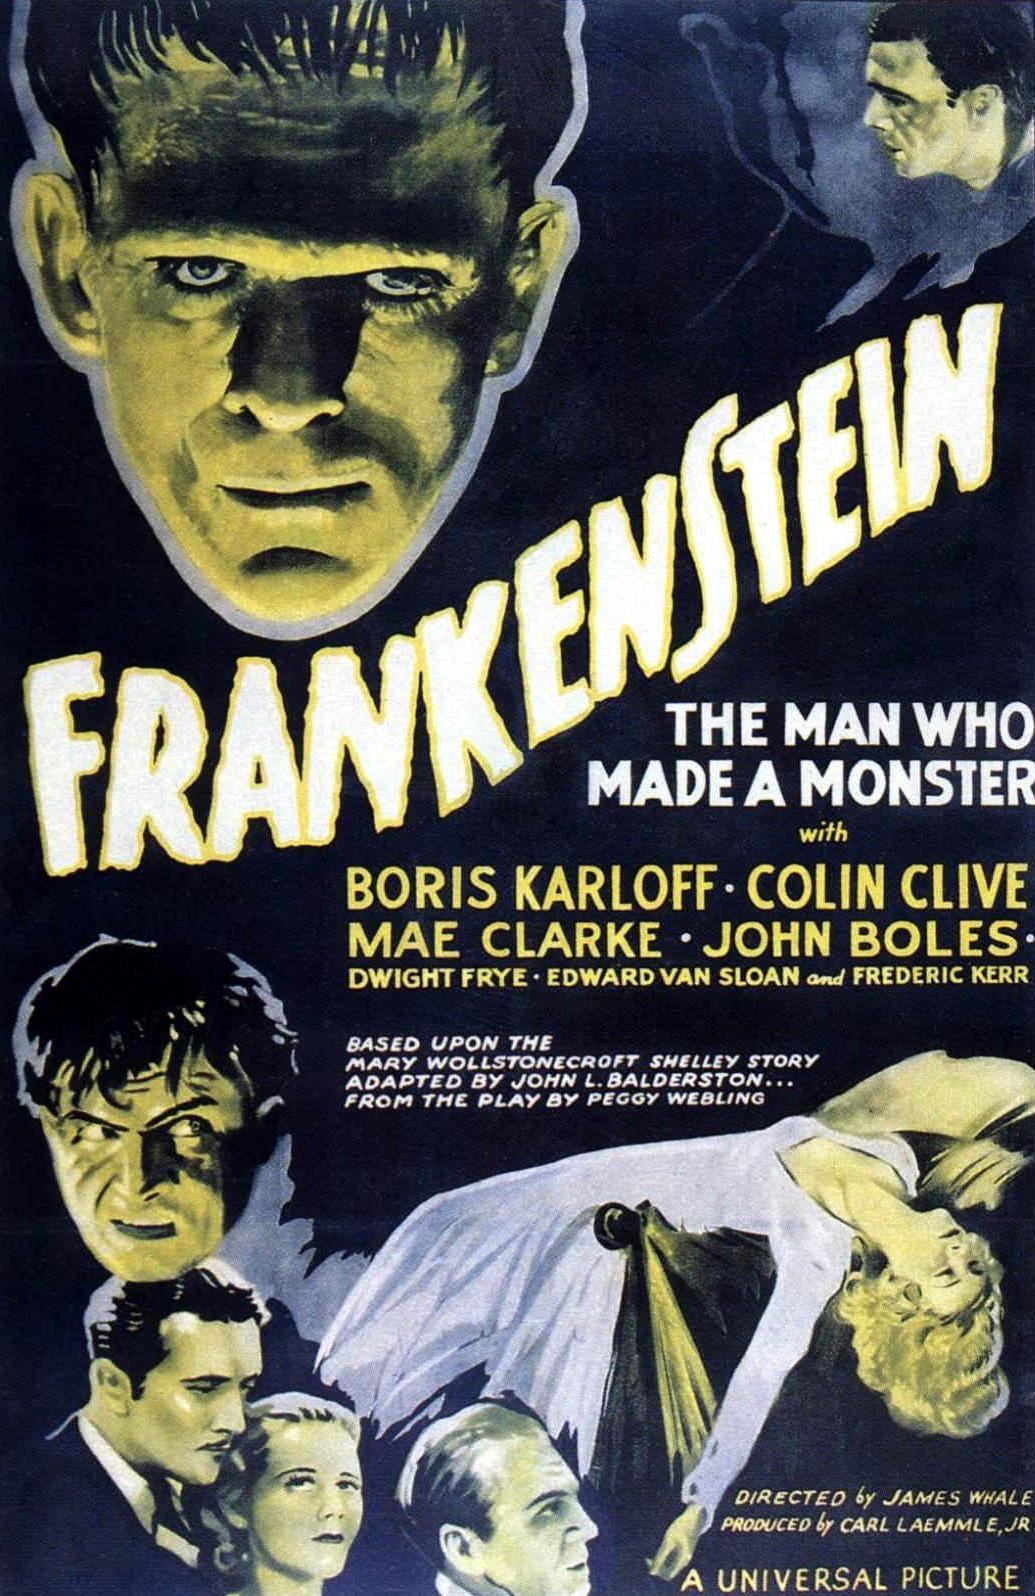 frankenstein-poster-classic-movies-19761154-1035-1596.jpg